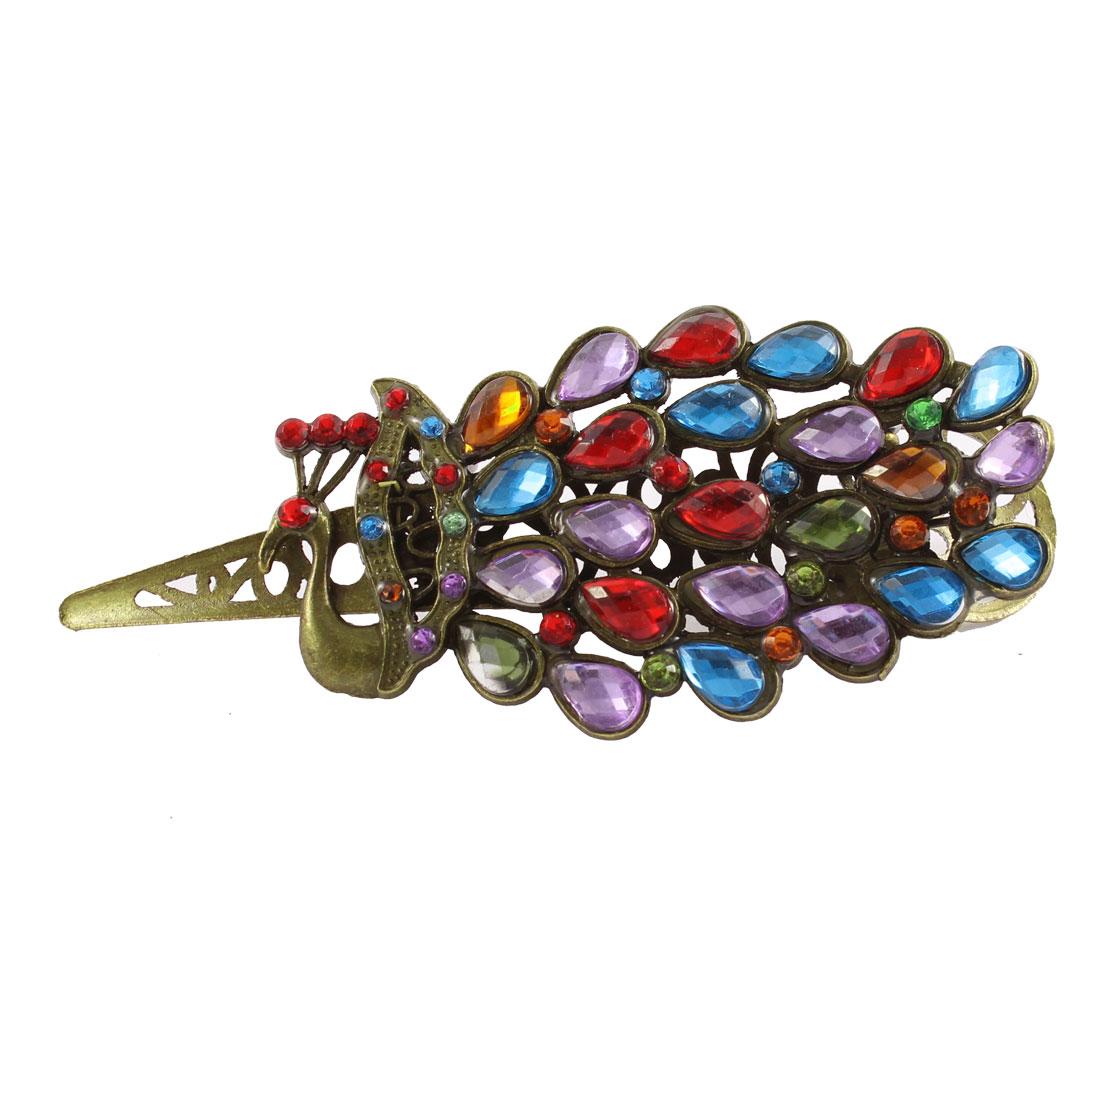 Rhinestone Decor Women Bling Hair Pin Haircilp Barrette Claw Colorful